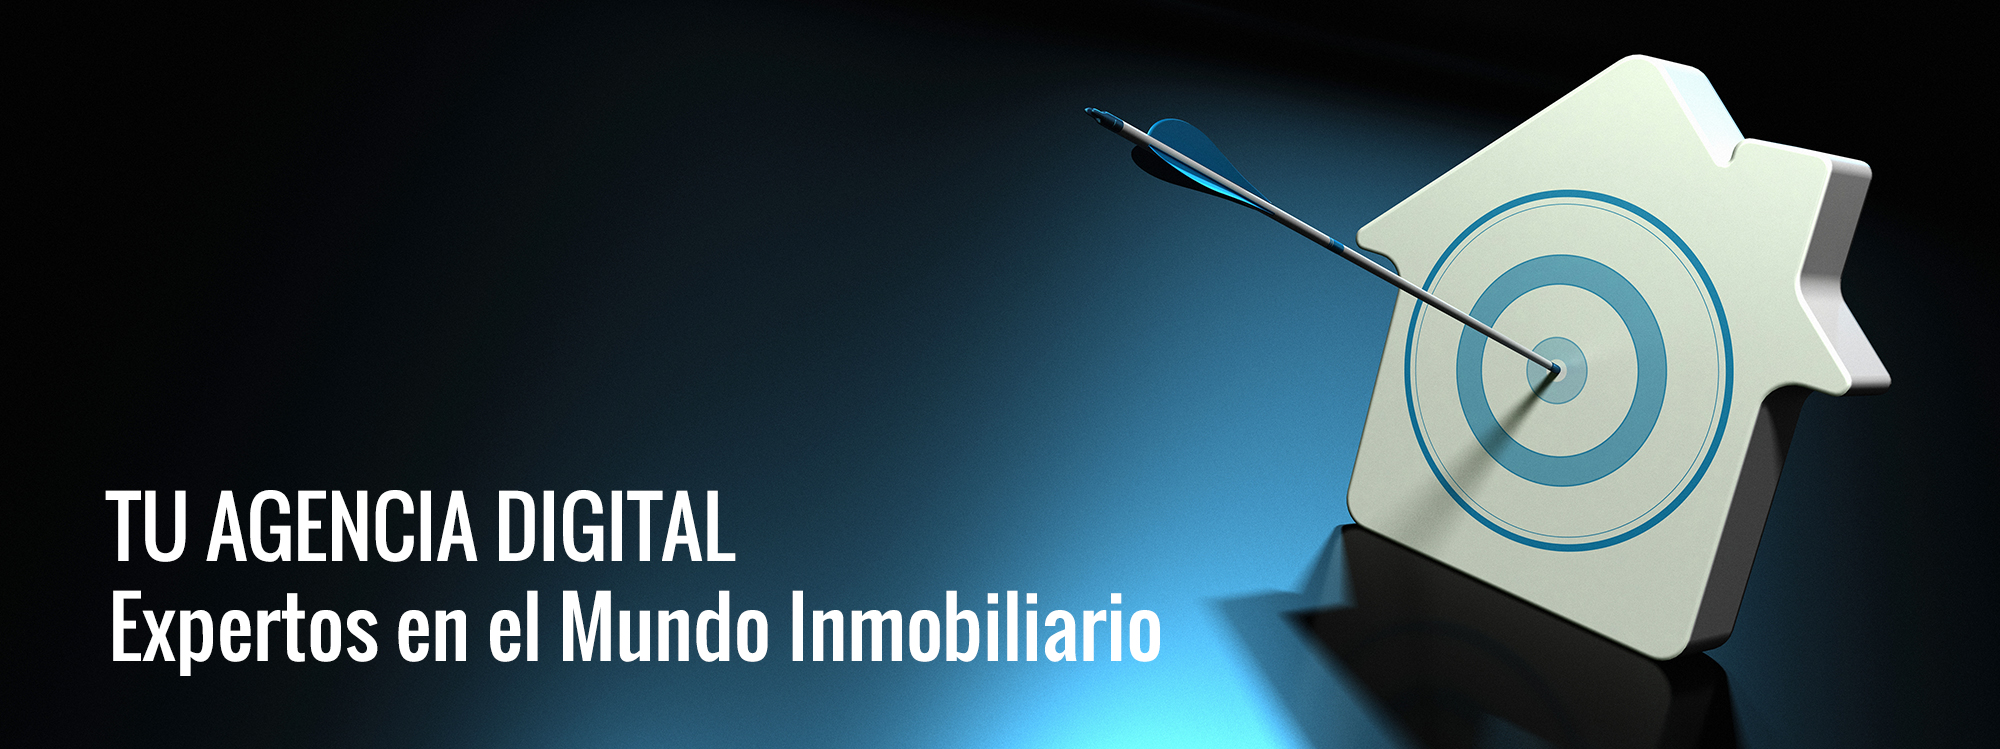 Banner Agencia Digital para Inmobiliarias